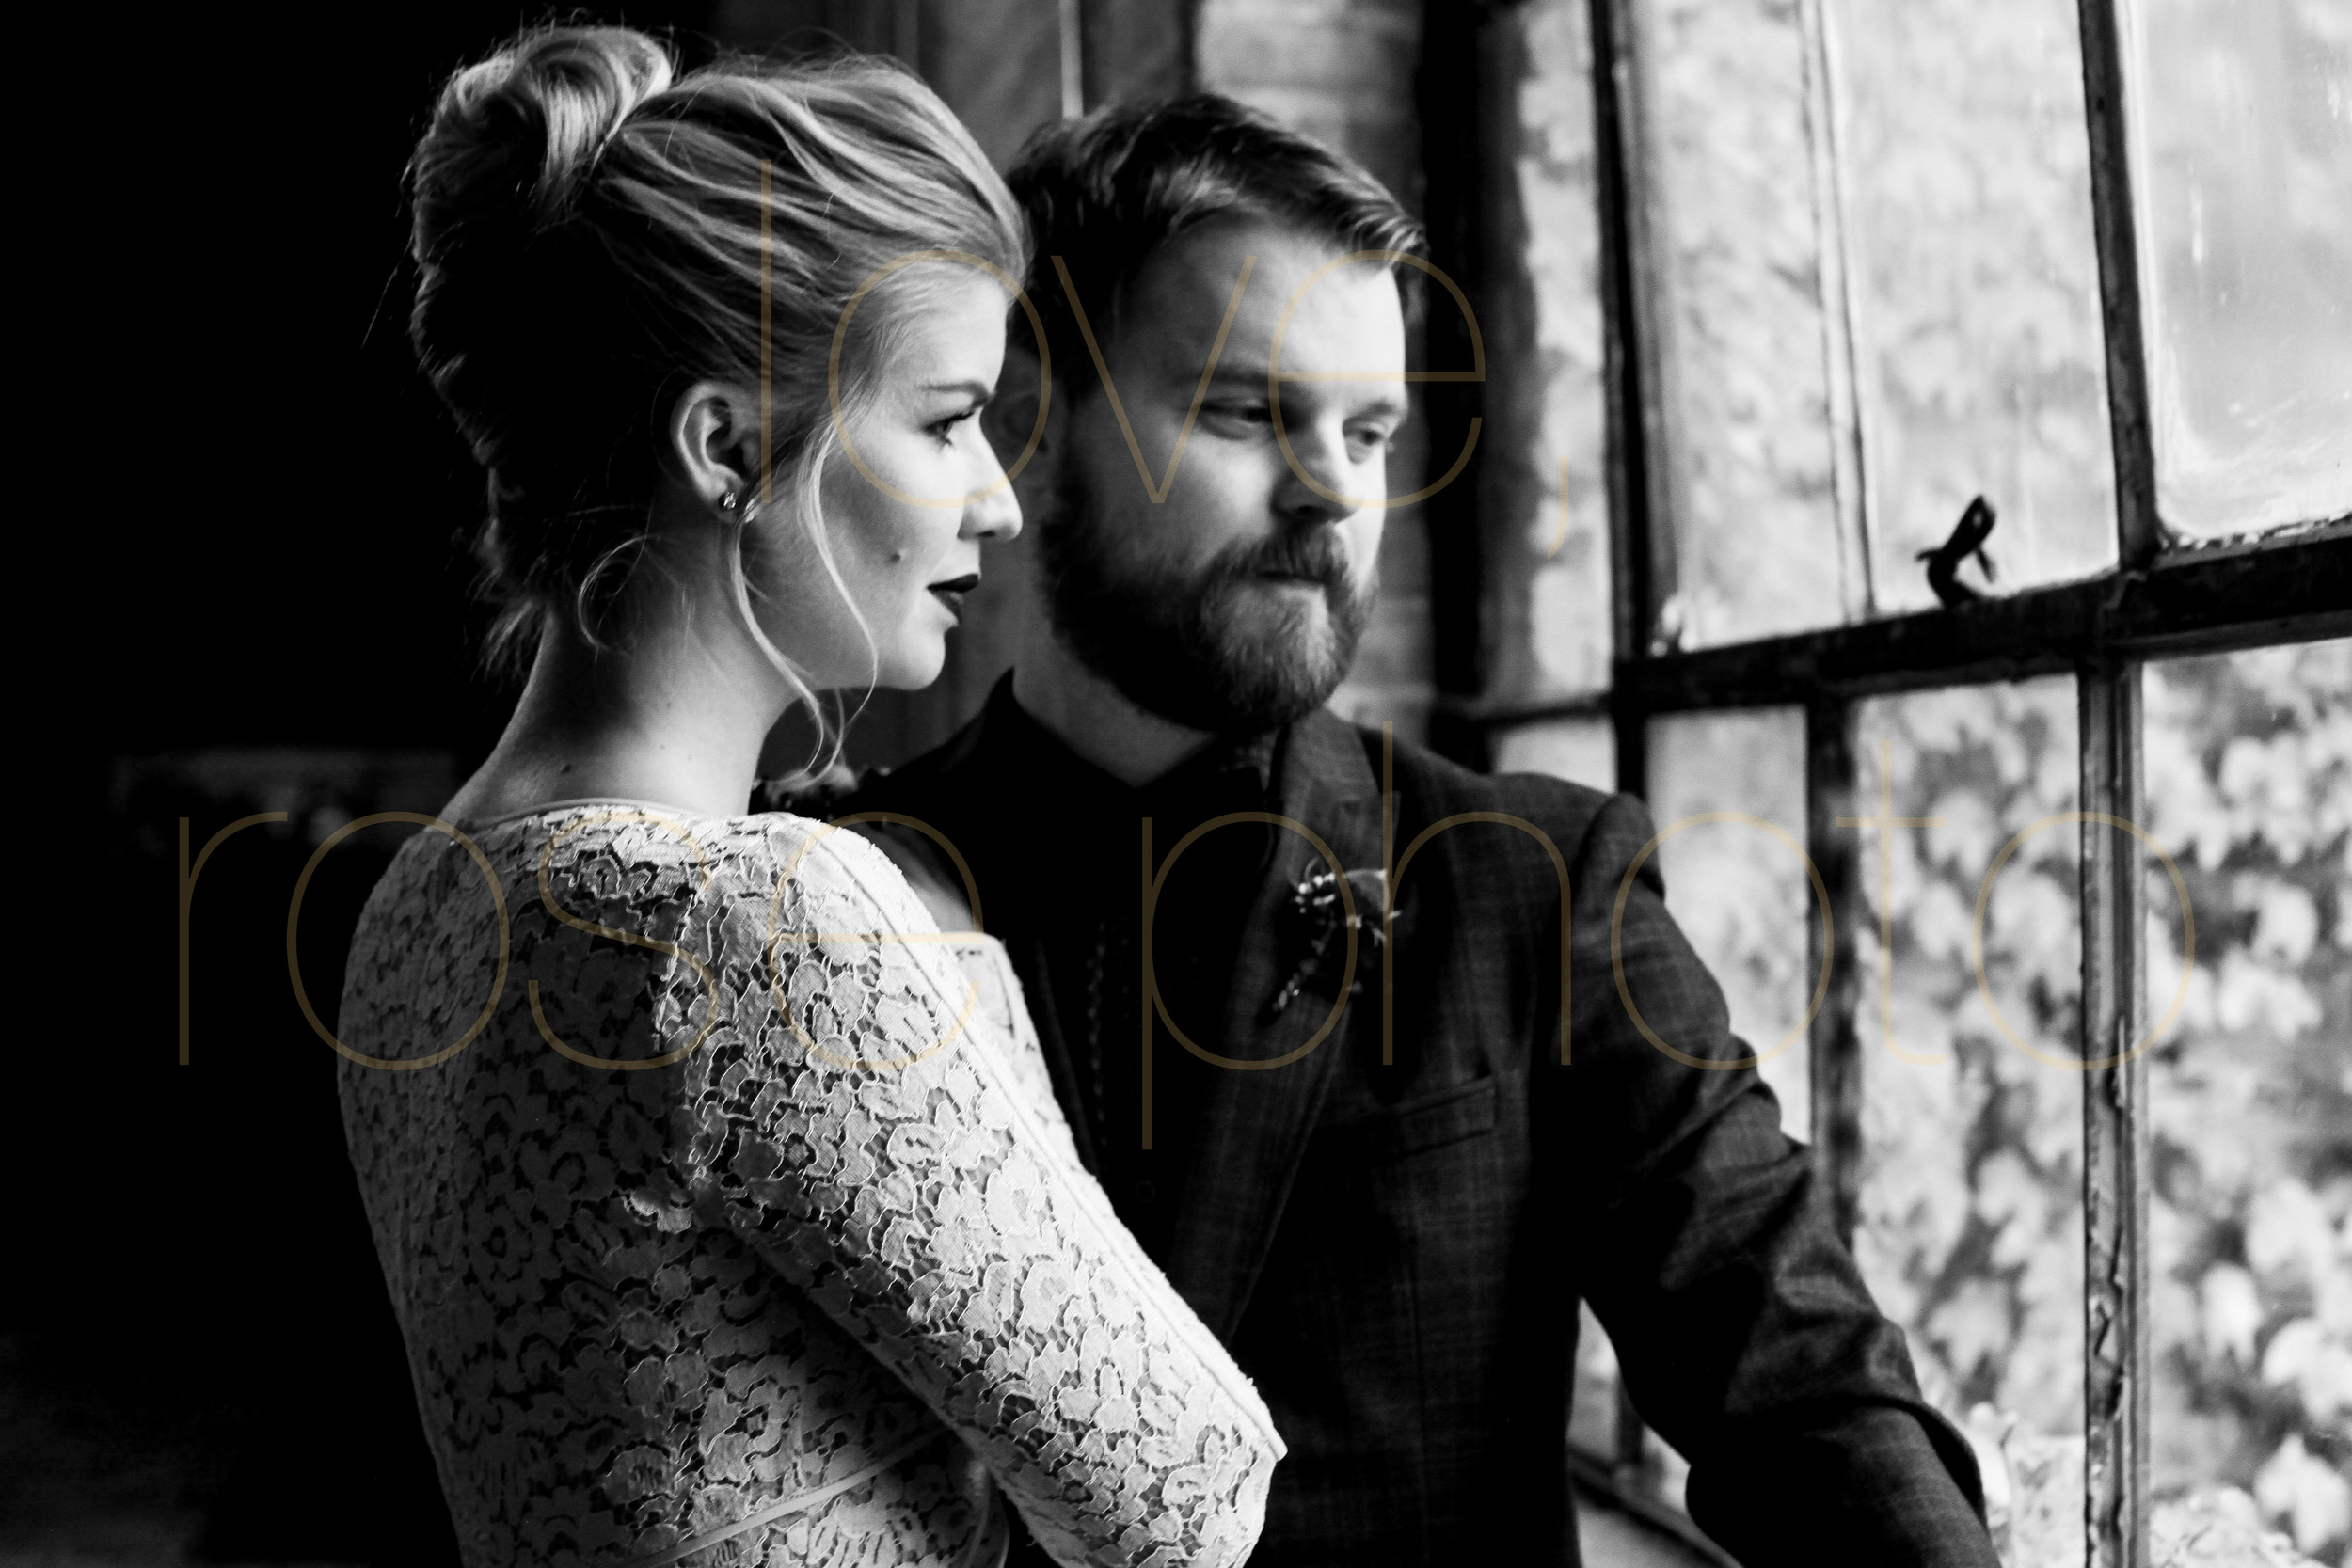 West Fulton Chicago Wedding Venue Salvage One photography enagement photos bride groom first dance-17.jpg